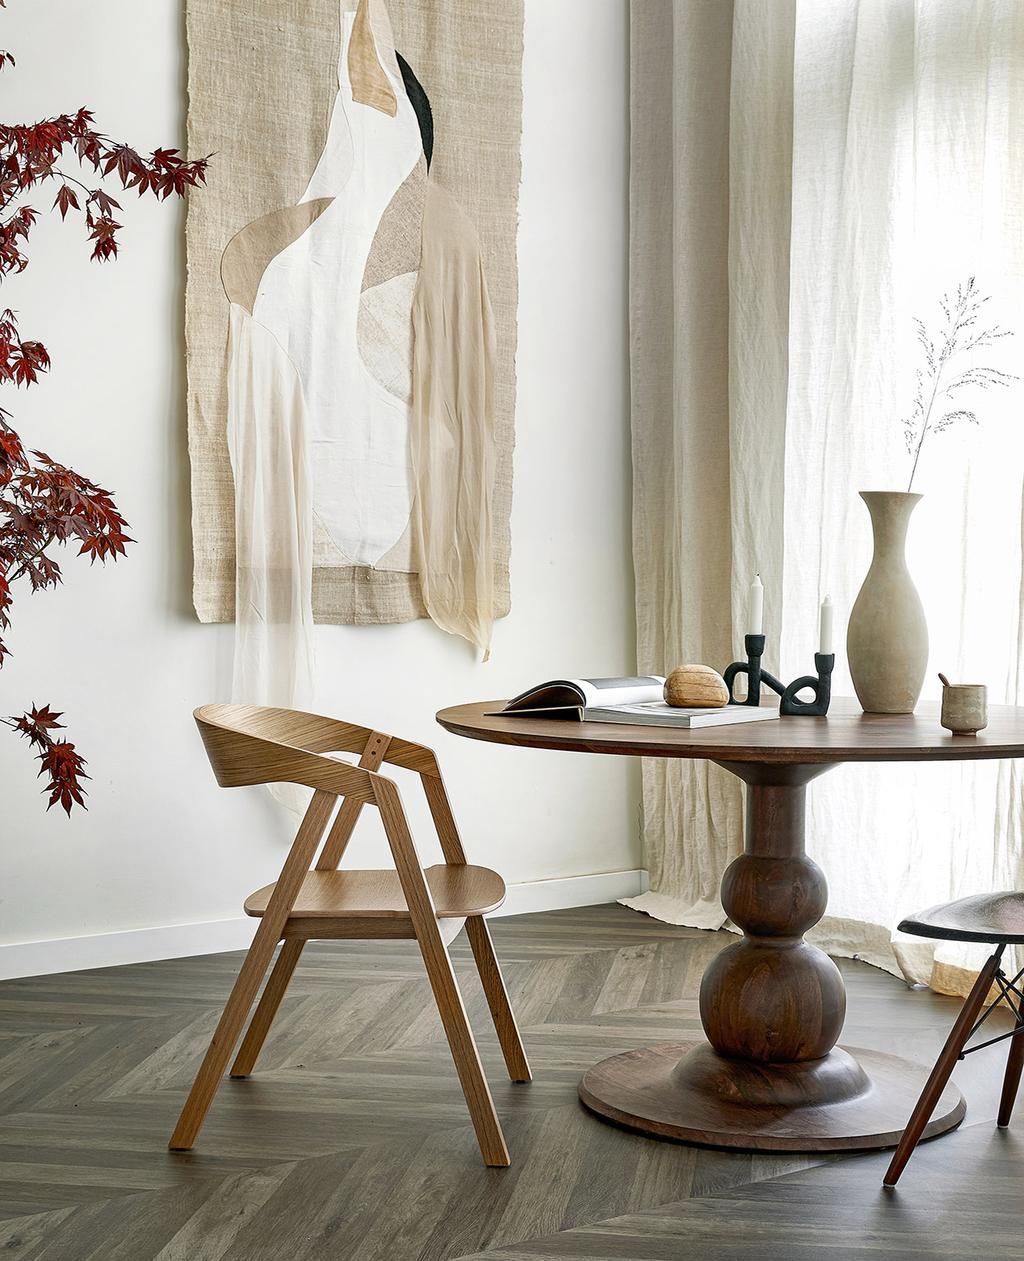 vtwonen 07-2021 |  cortinas mesa redonda com piso pontiagudo húngaro |  materiais do estilo de vida básico